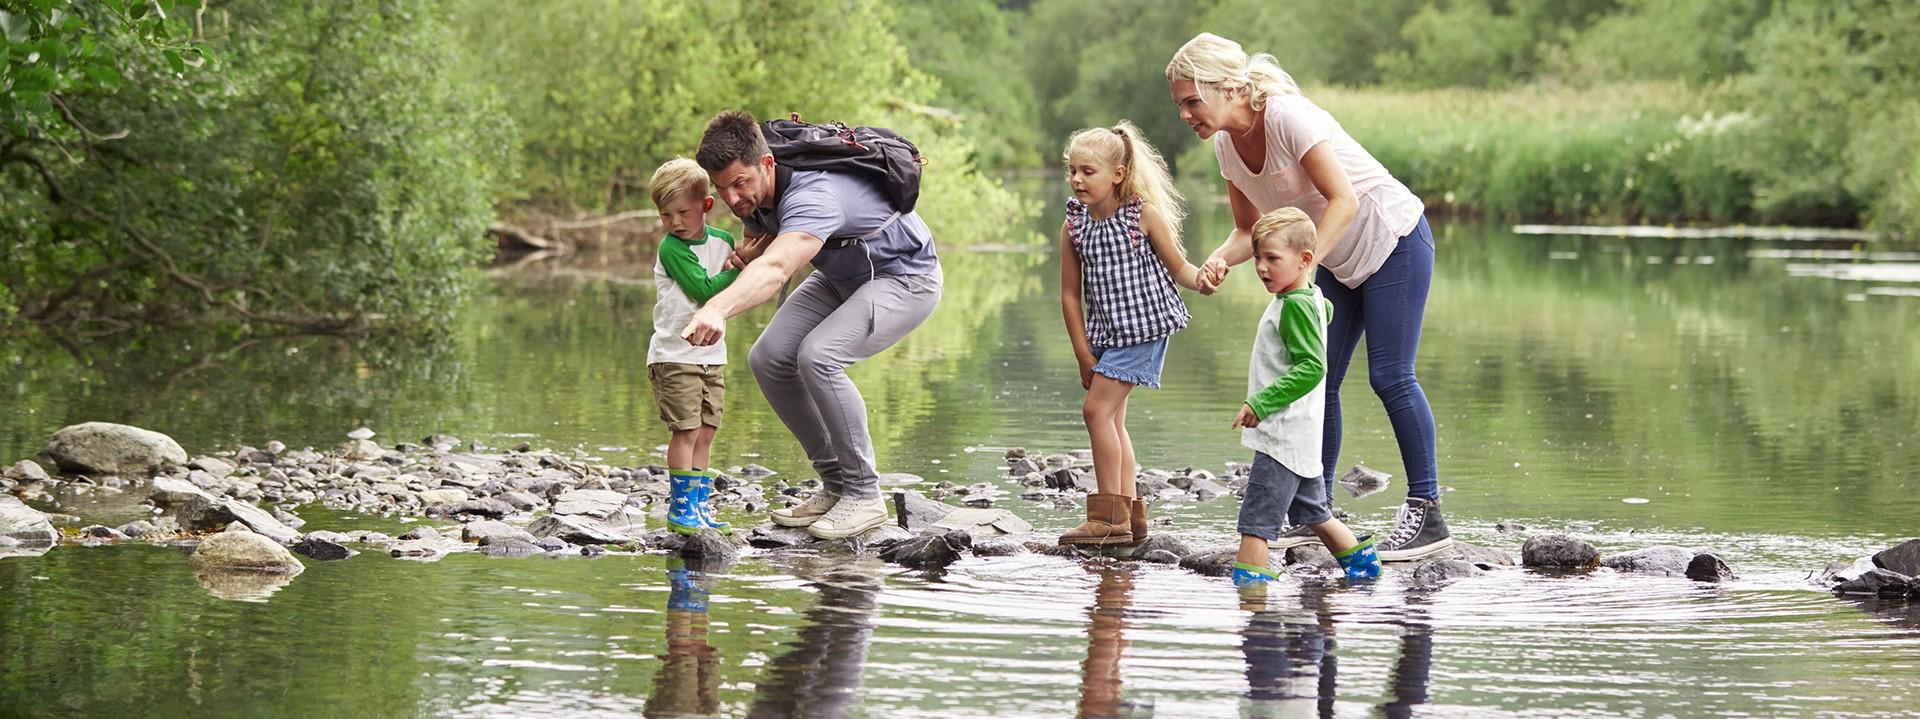 Familie überquert einen Fluss